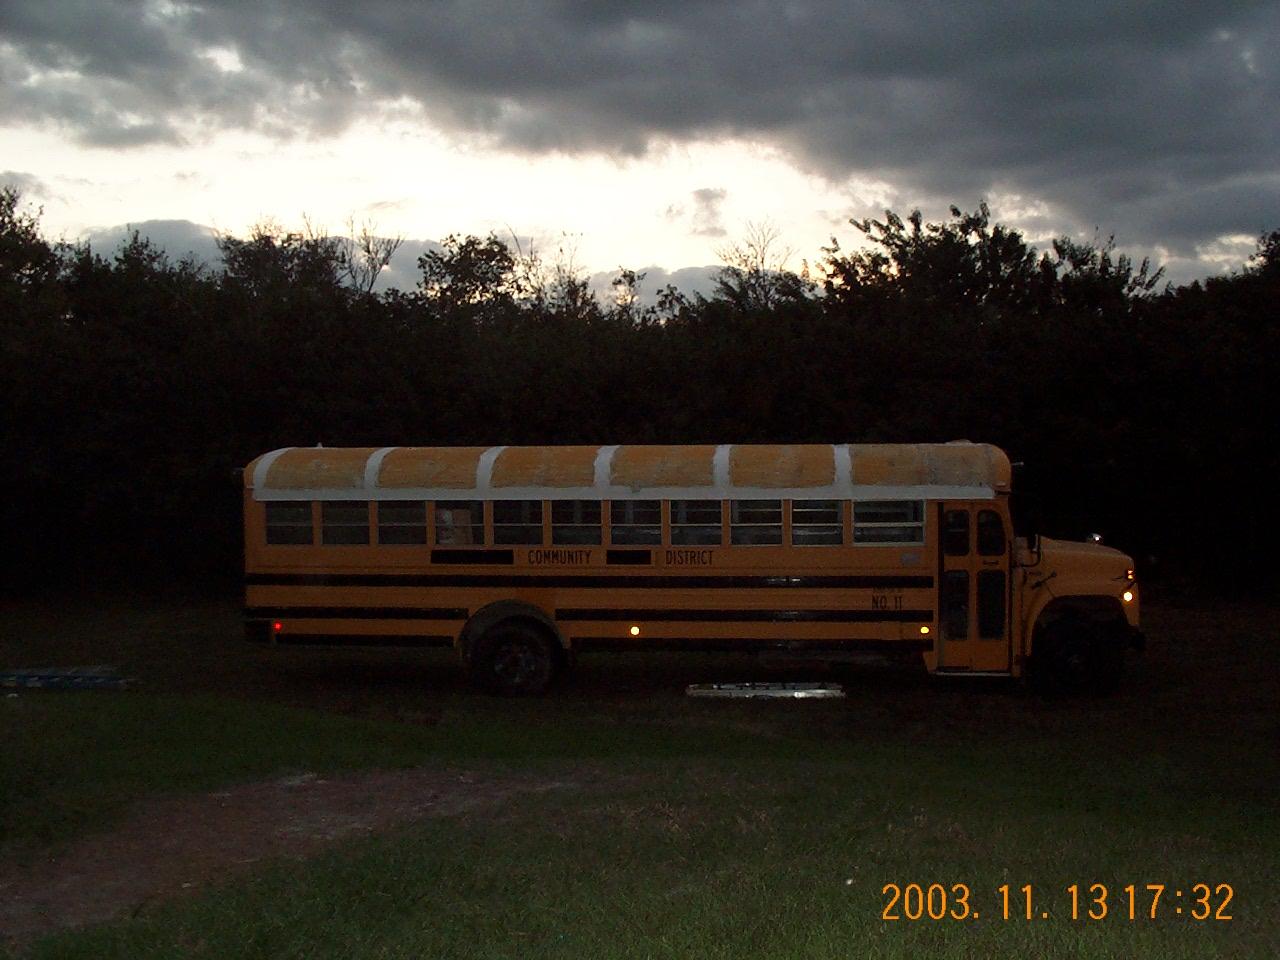 Bus 16Nov03 001